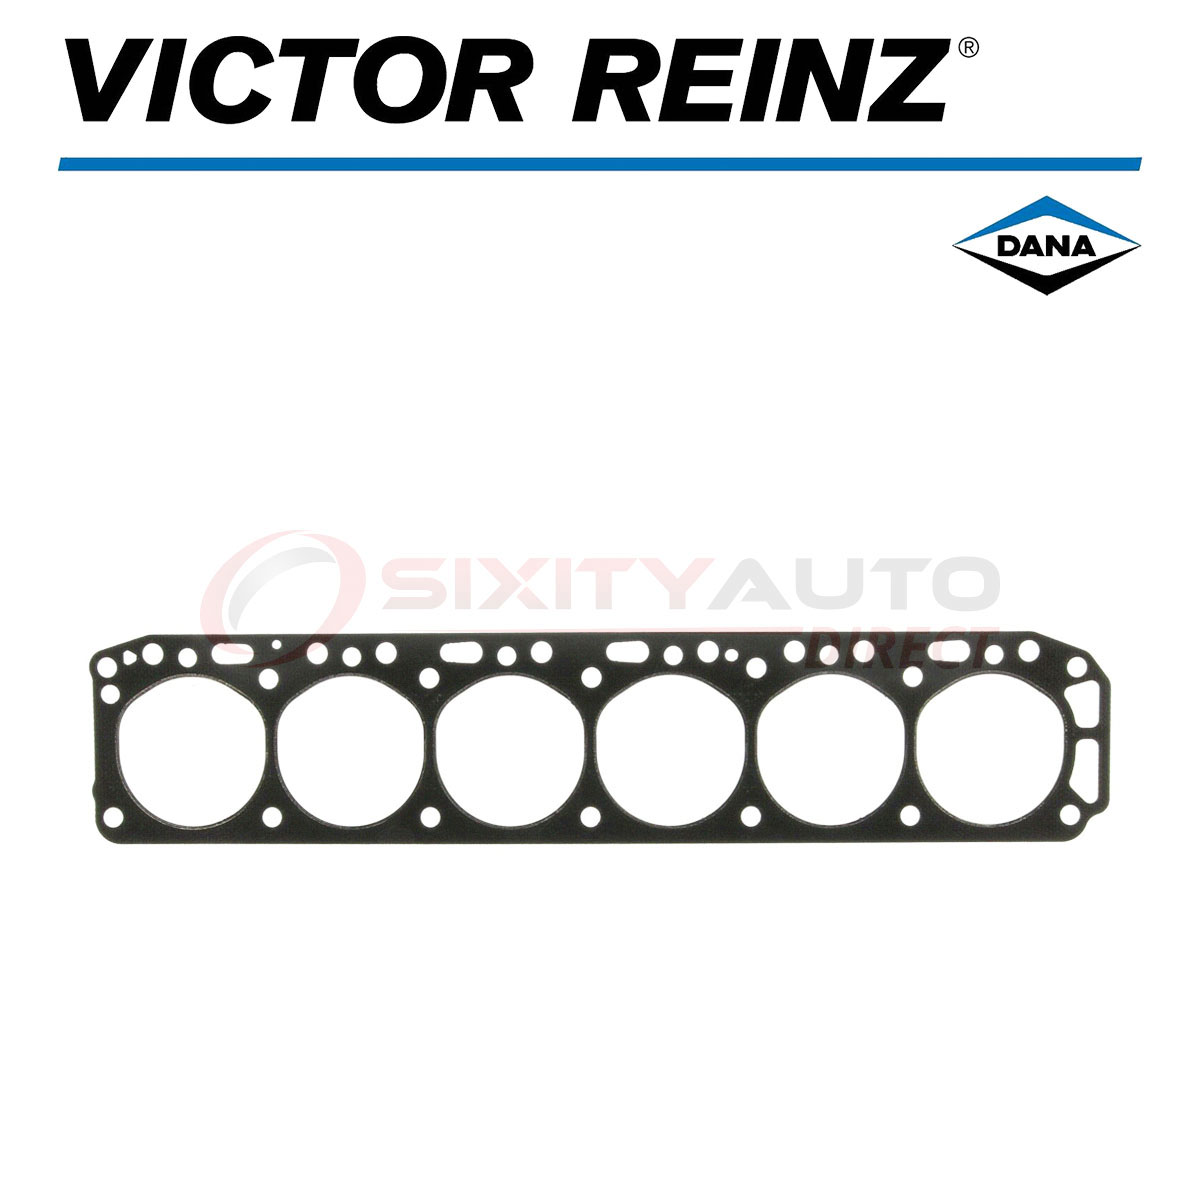 Victor Reinz Cylinder Head Gasket For Chevrolet